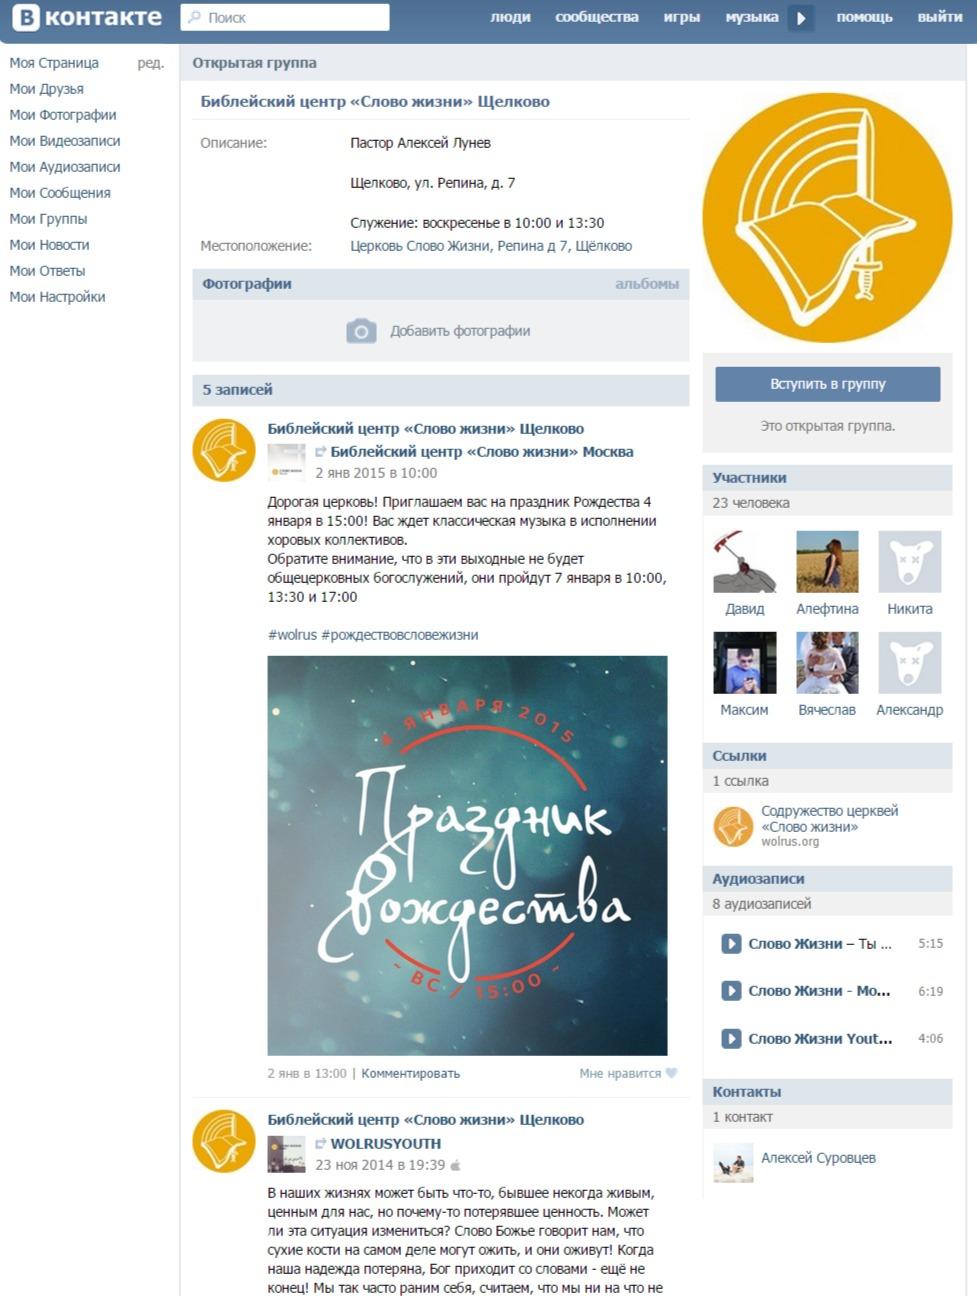 FireShot Capture - Библейский центр «Слово жизни» Щелково - https___vk.com_club80549356.jpg